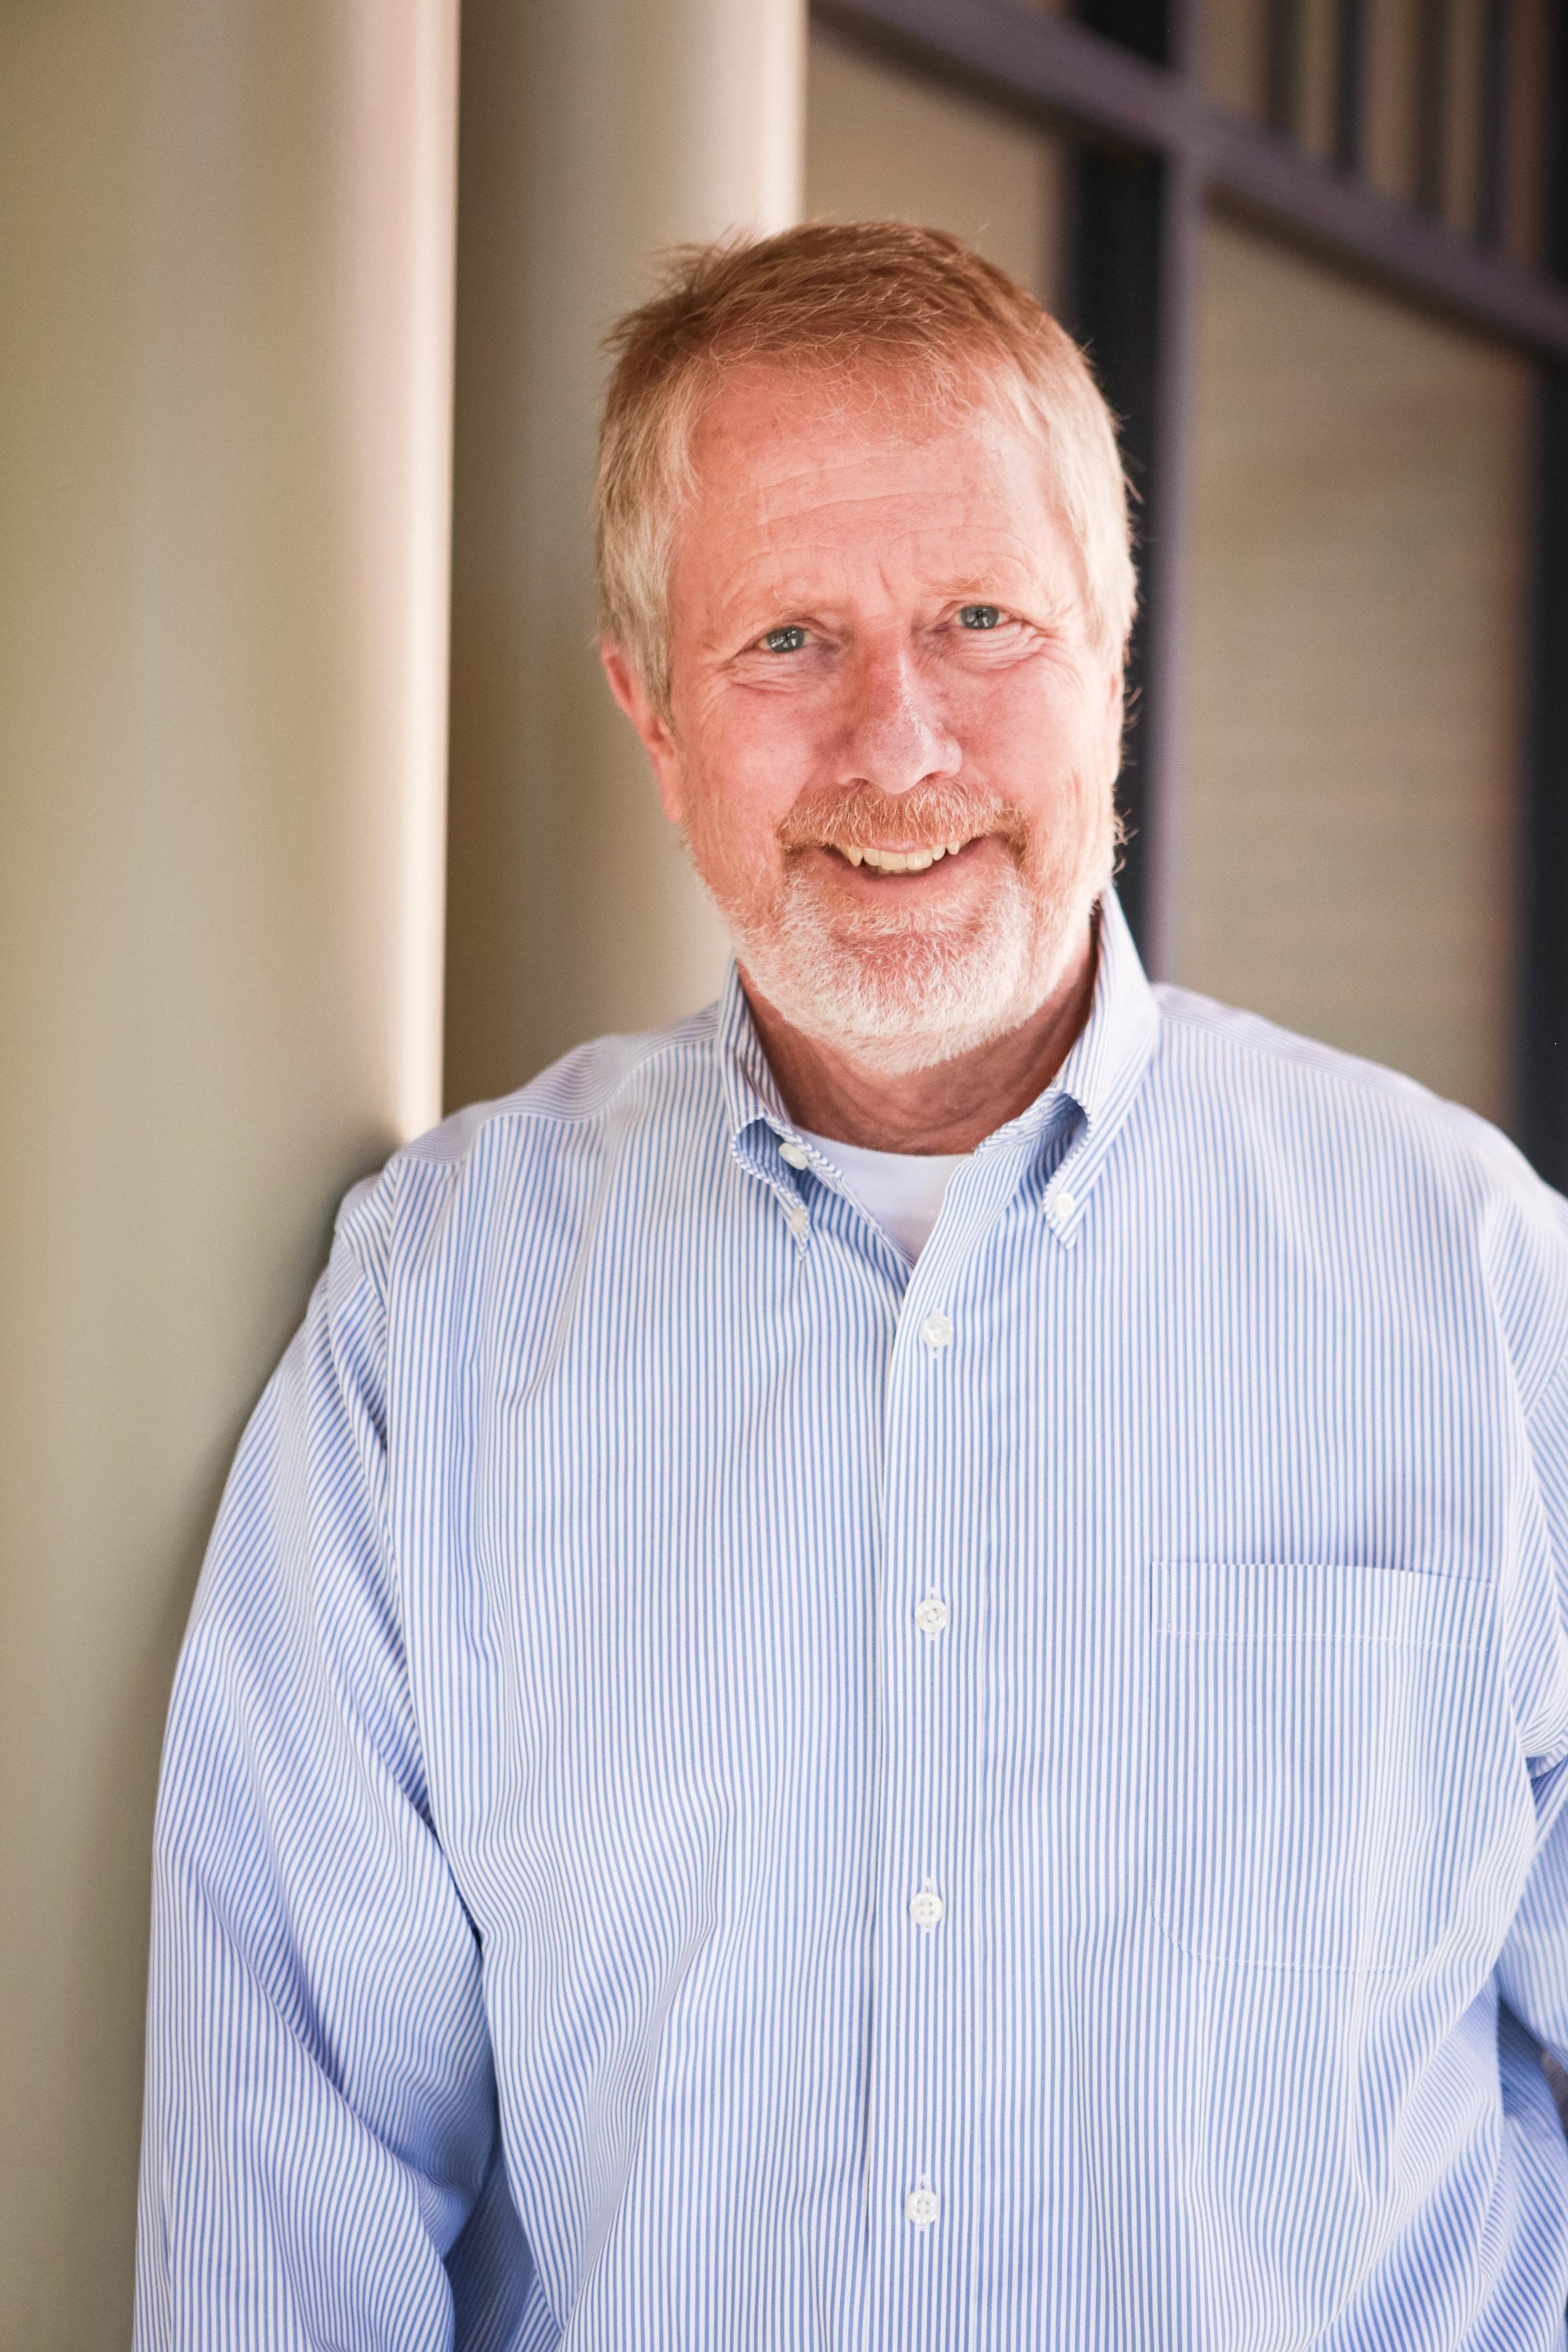 C. Brad Peterson